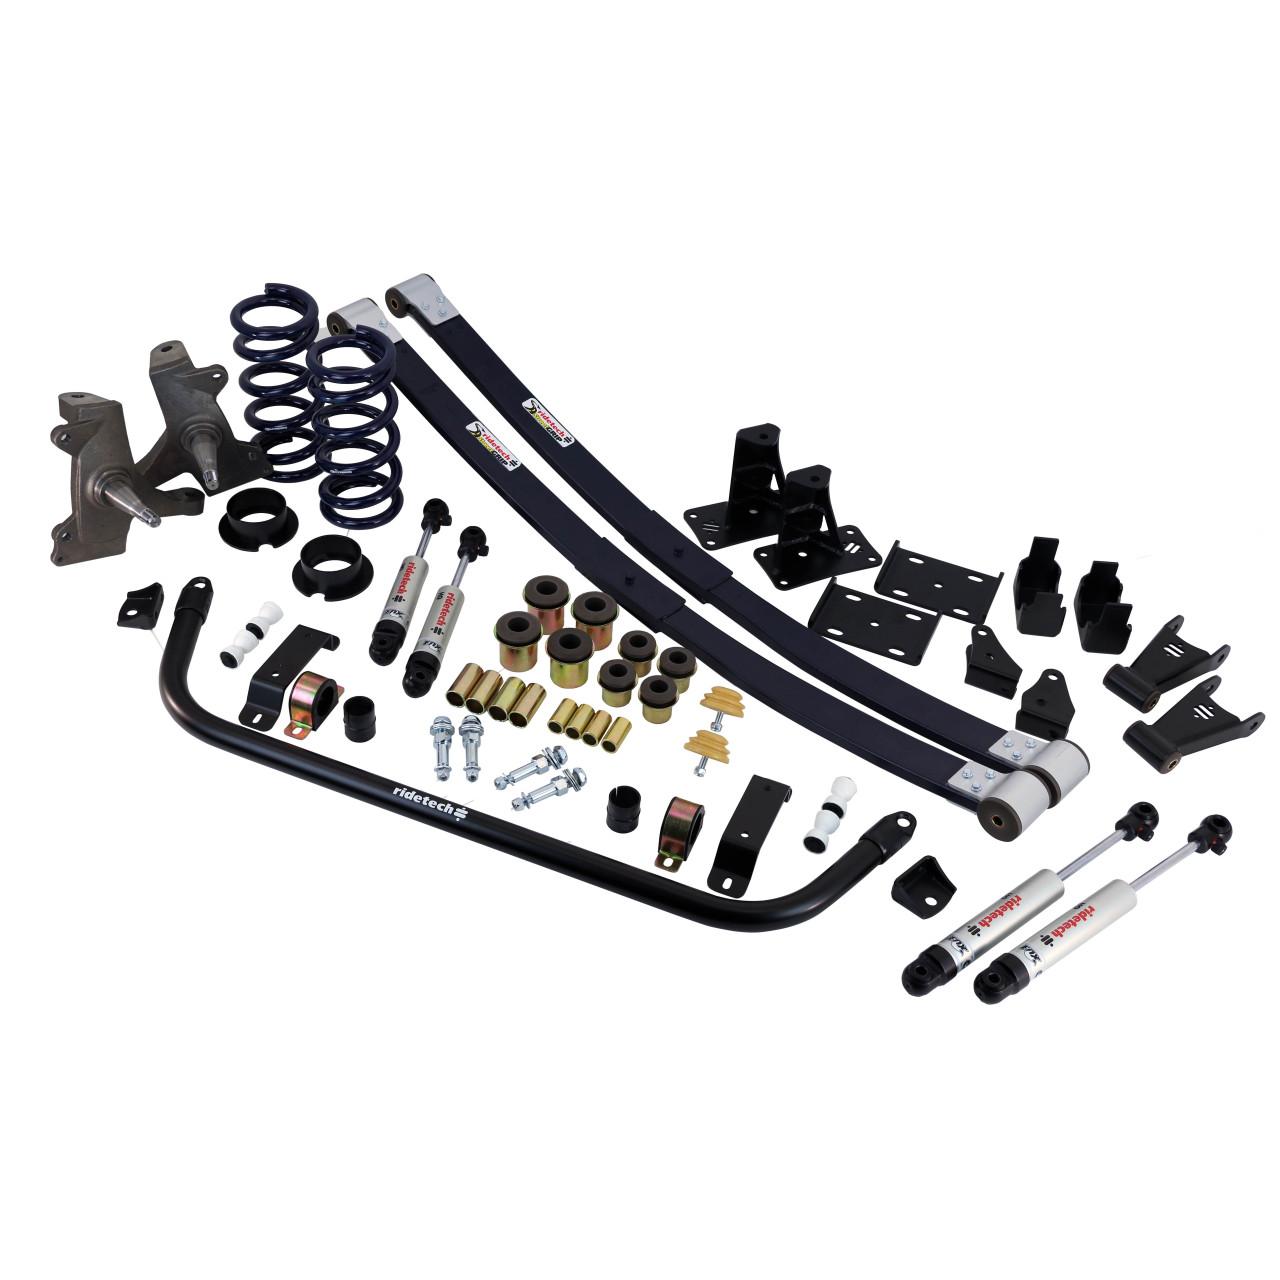 Zugzylinder tiges de traction cylindre hydraulique 10 T Body Shop Frame Réparation 00050